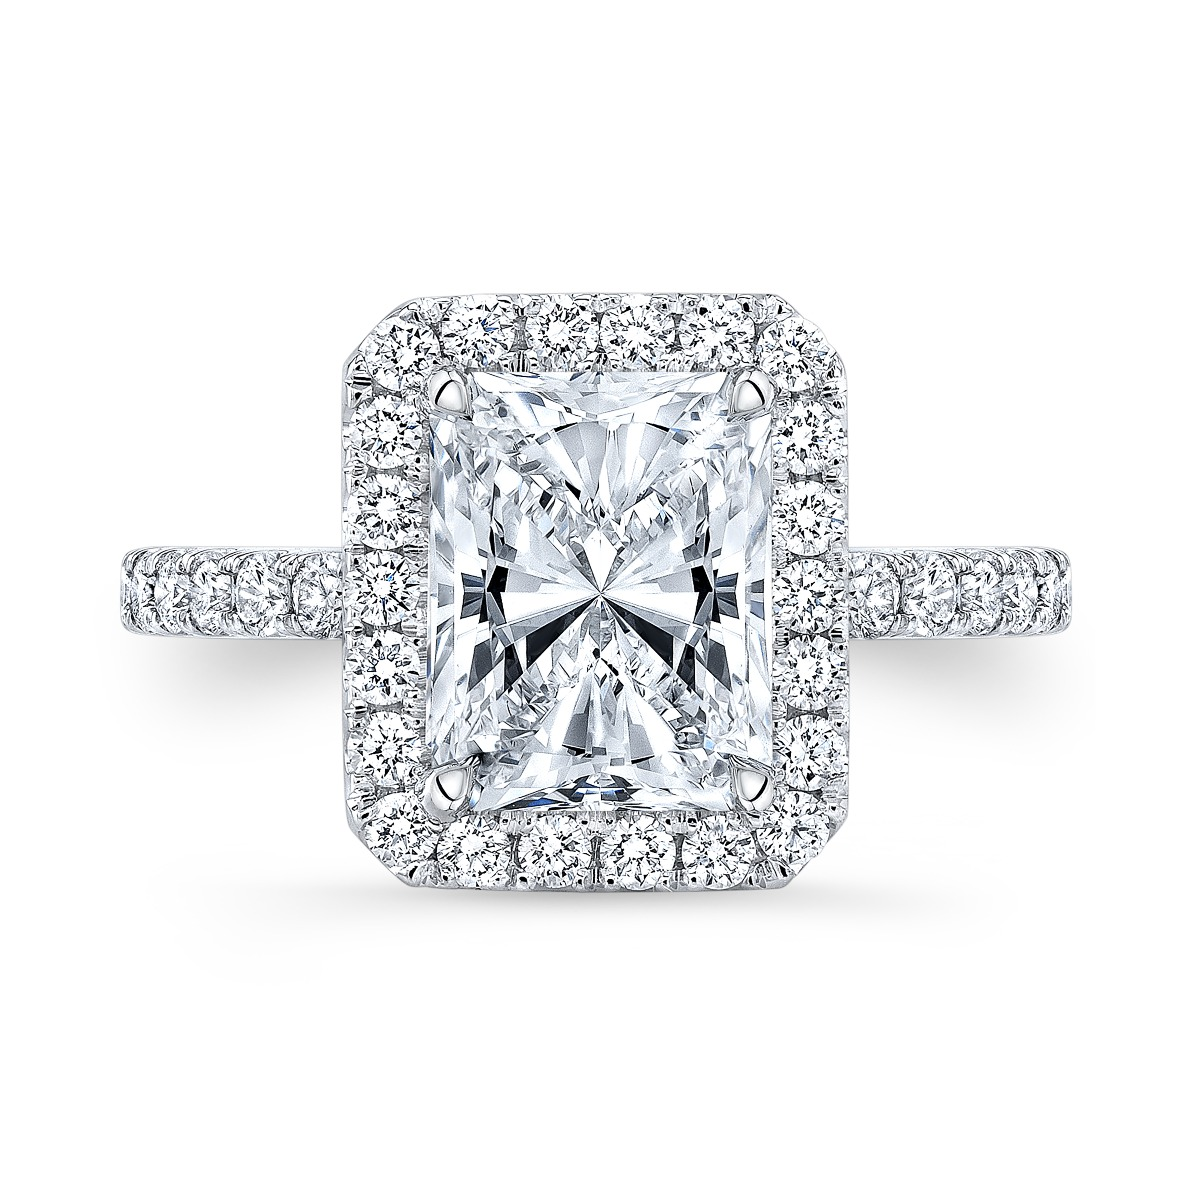 Cut Cornered Halo Pave Diamond Engagement Ring